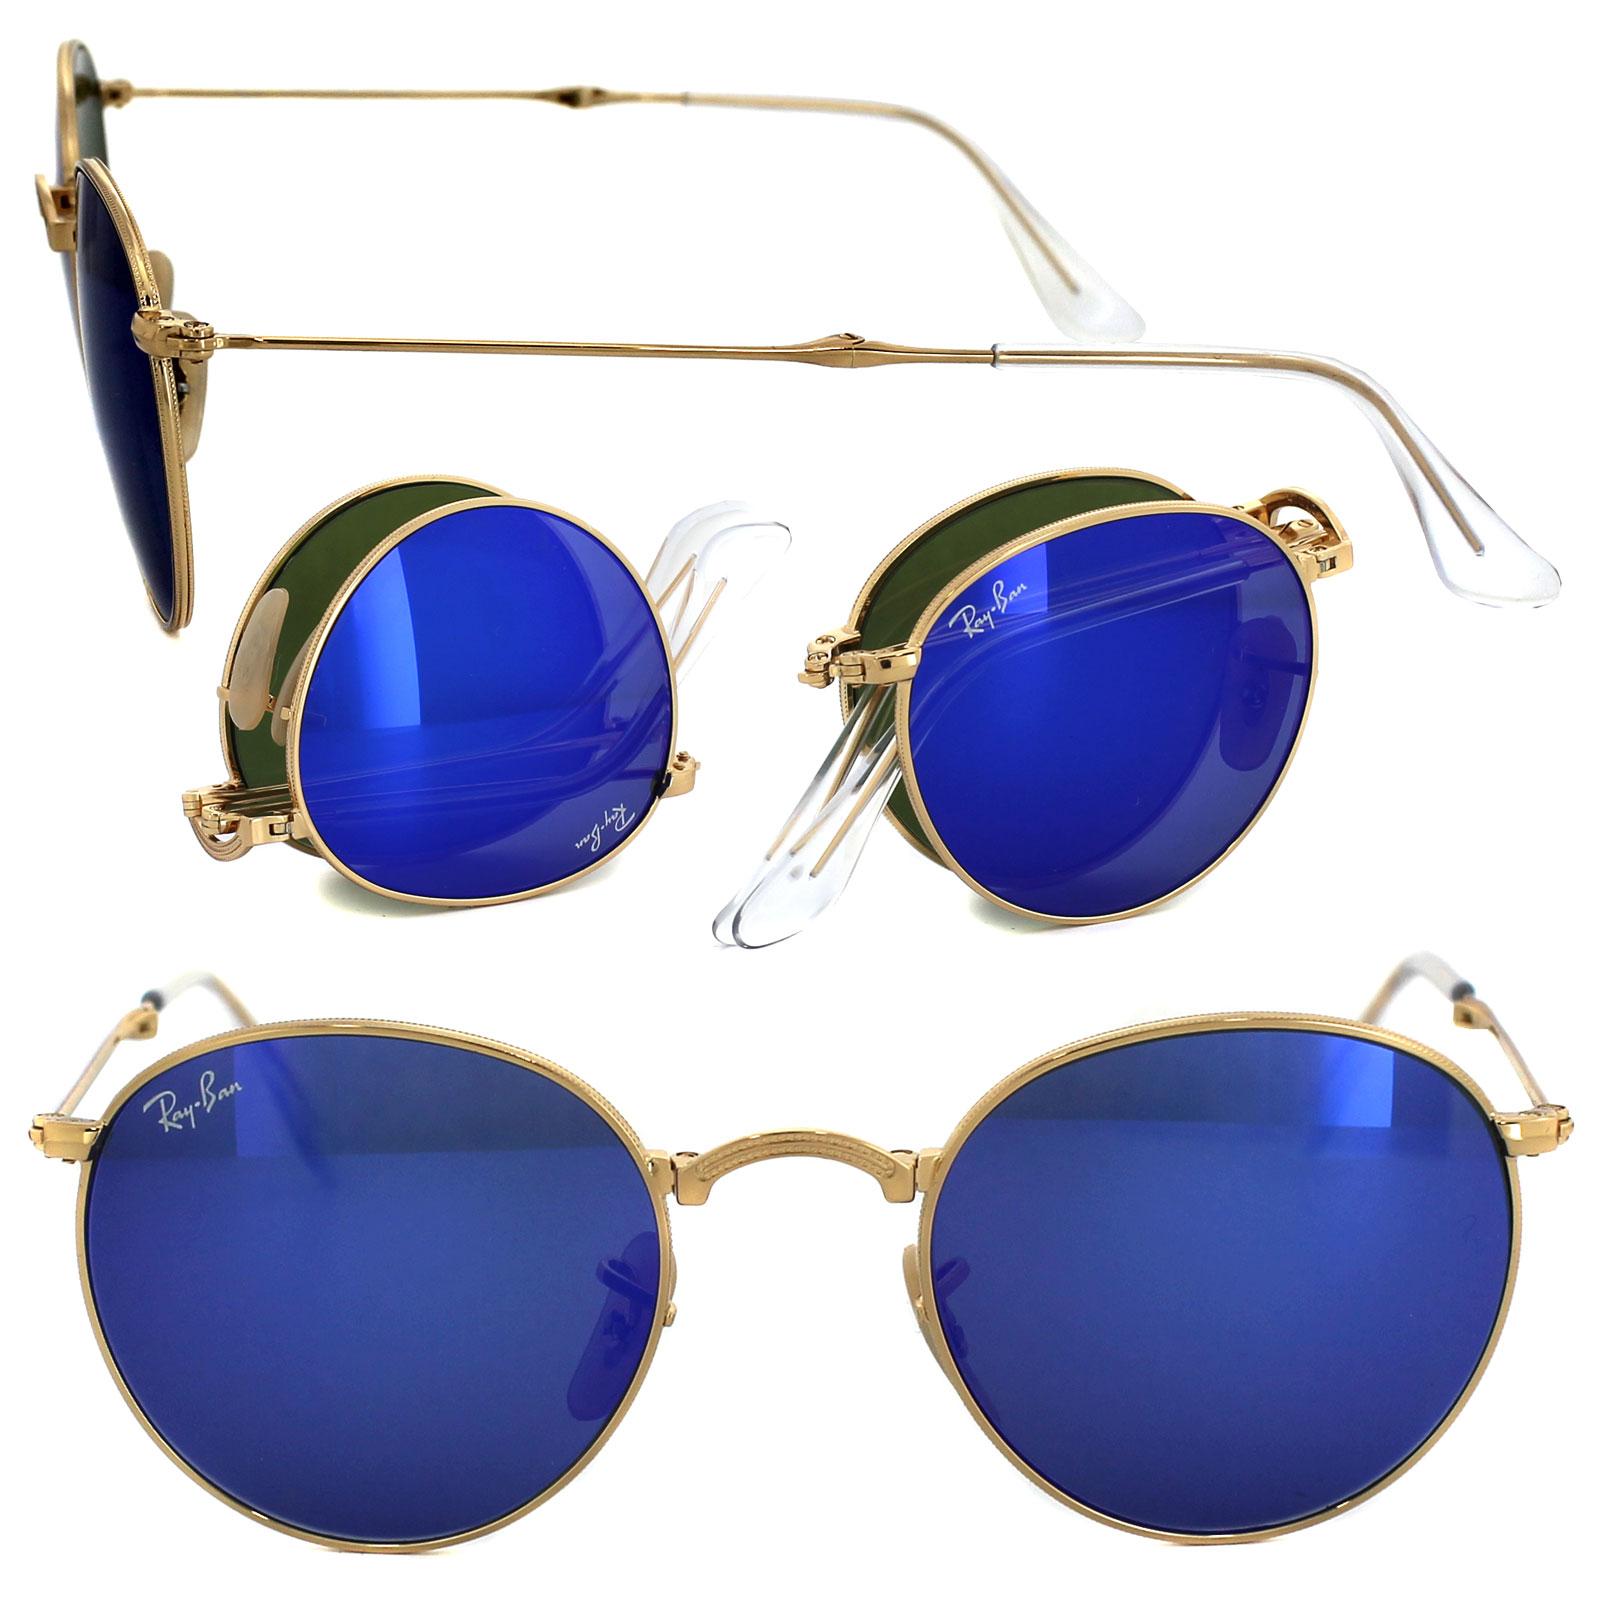 7324e026b7a Blue Mirror Ray Bans Ebay « Heritage Malta